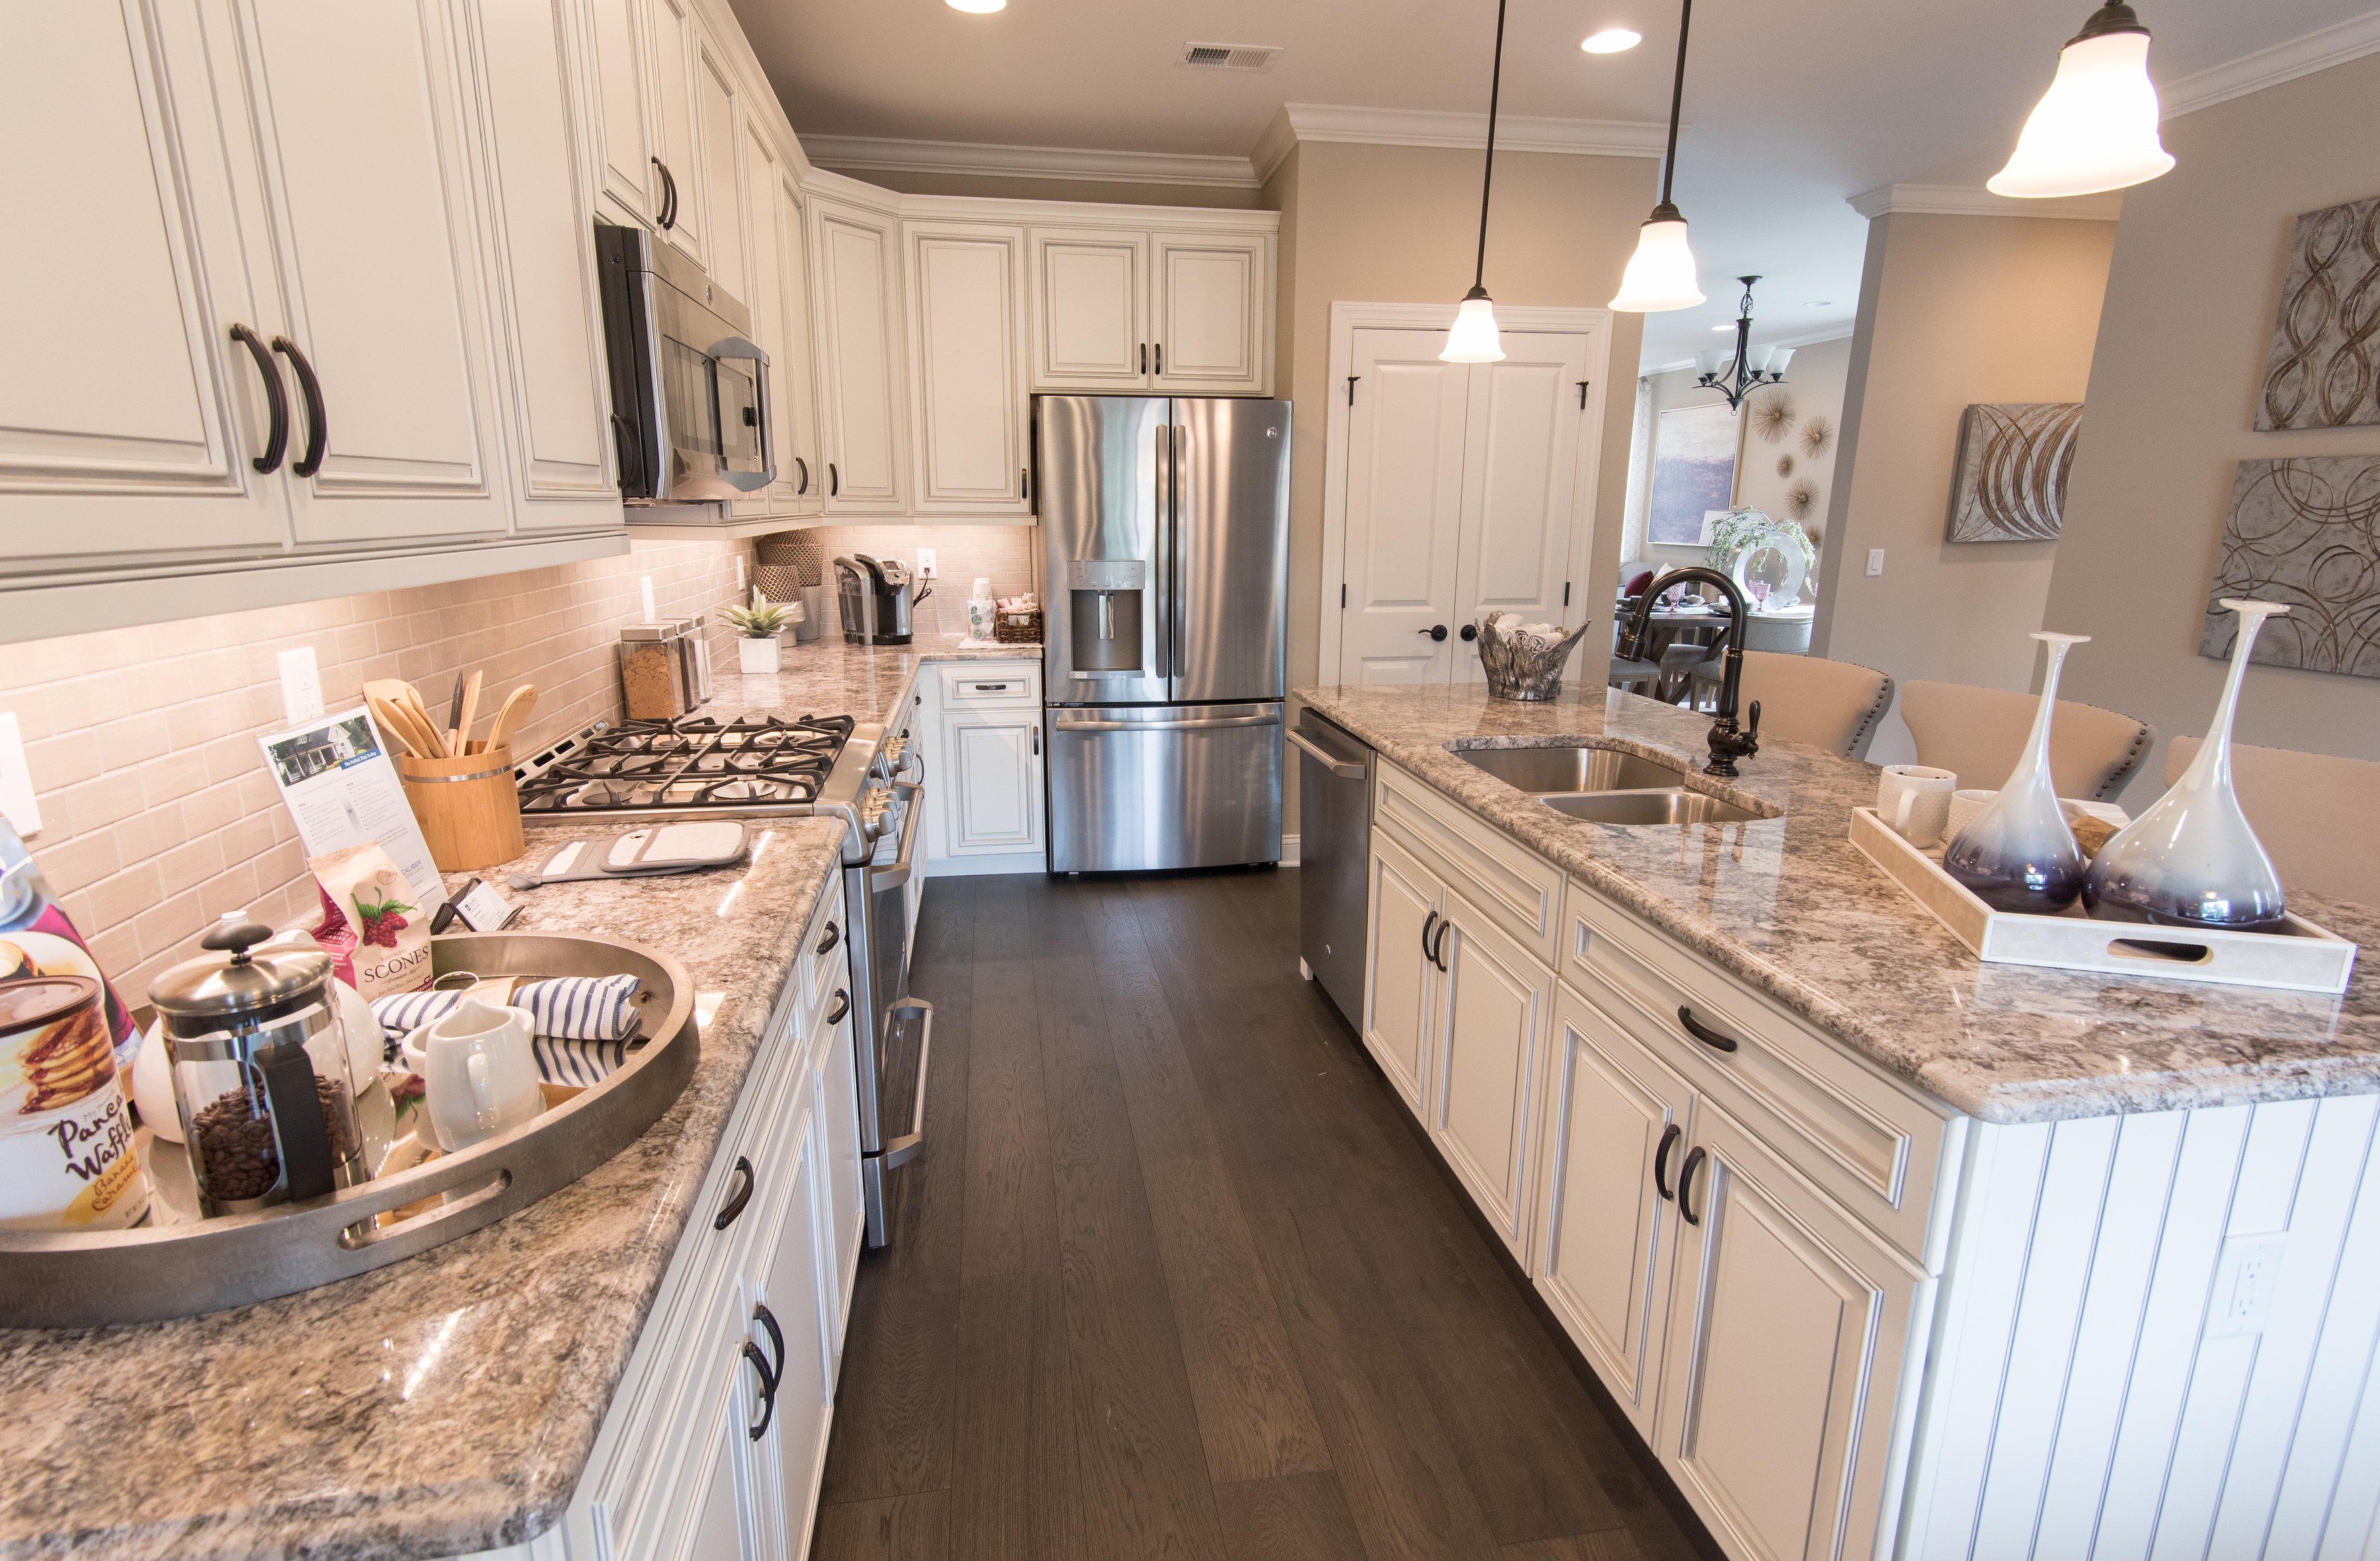 chesapeake kitchen design. The Kitchen In Chesapeake Home Design At Heritage Colonia. A